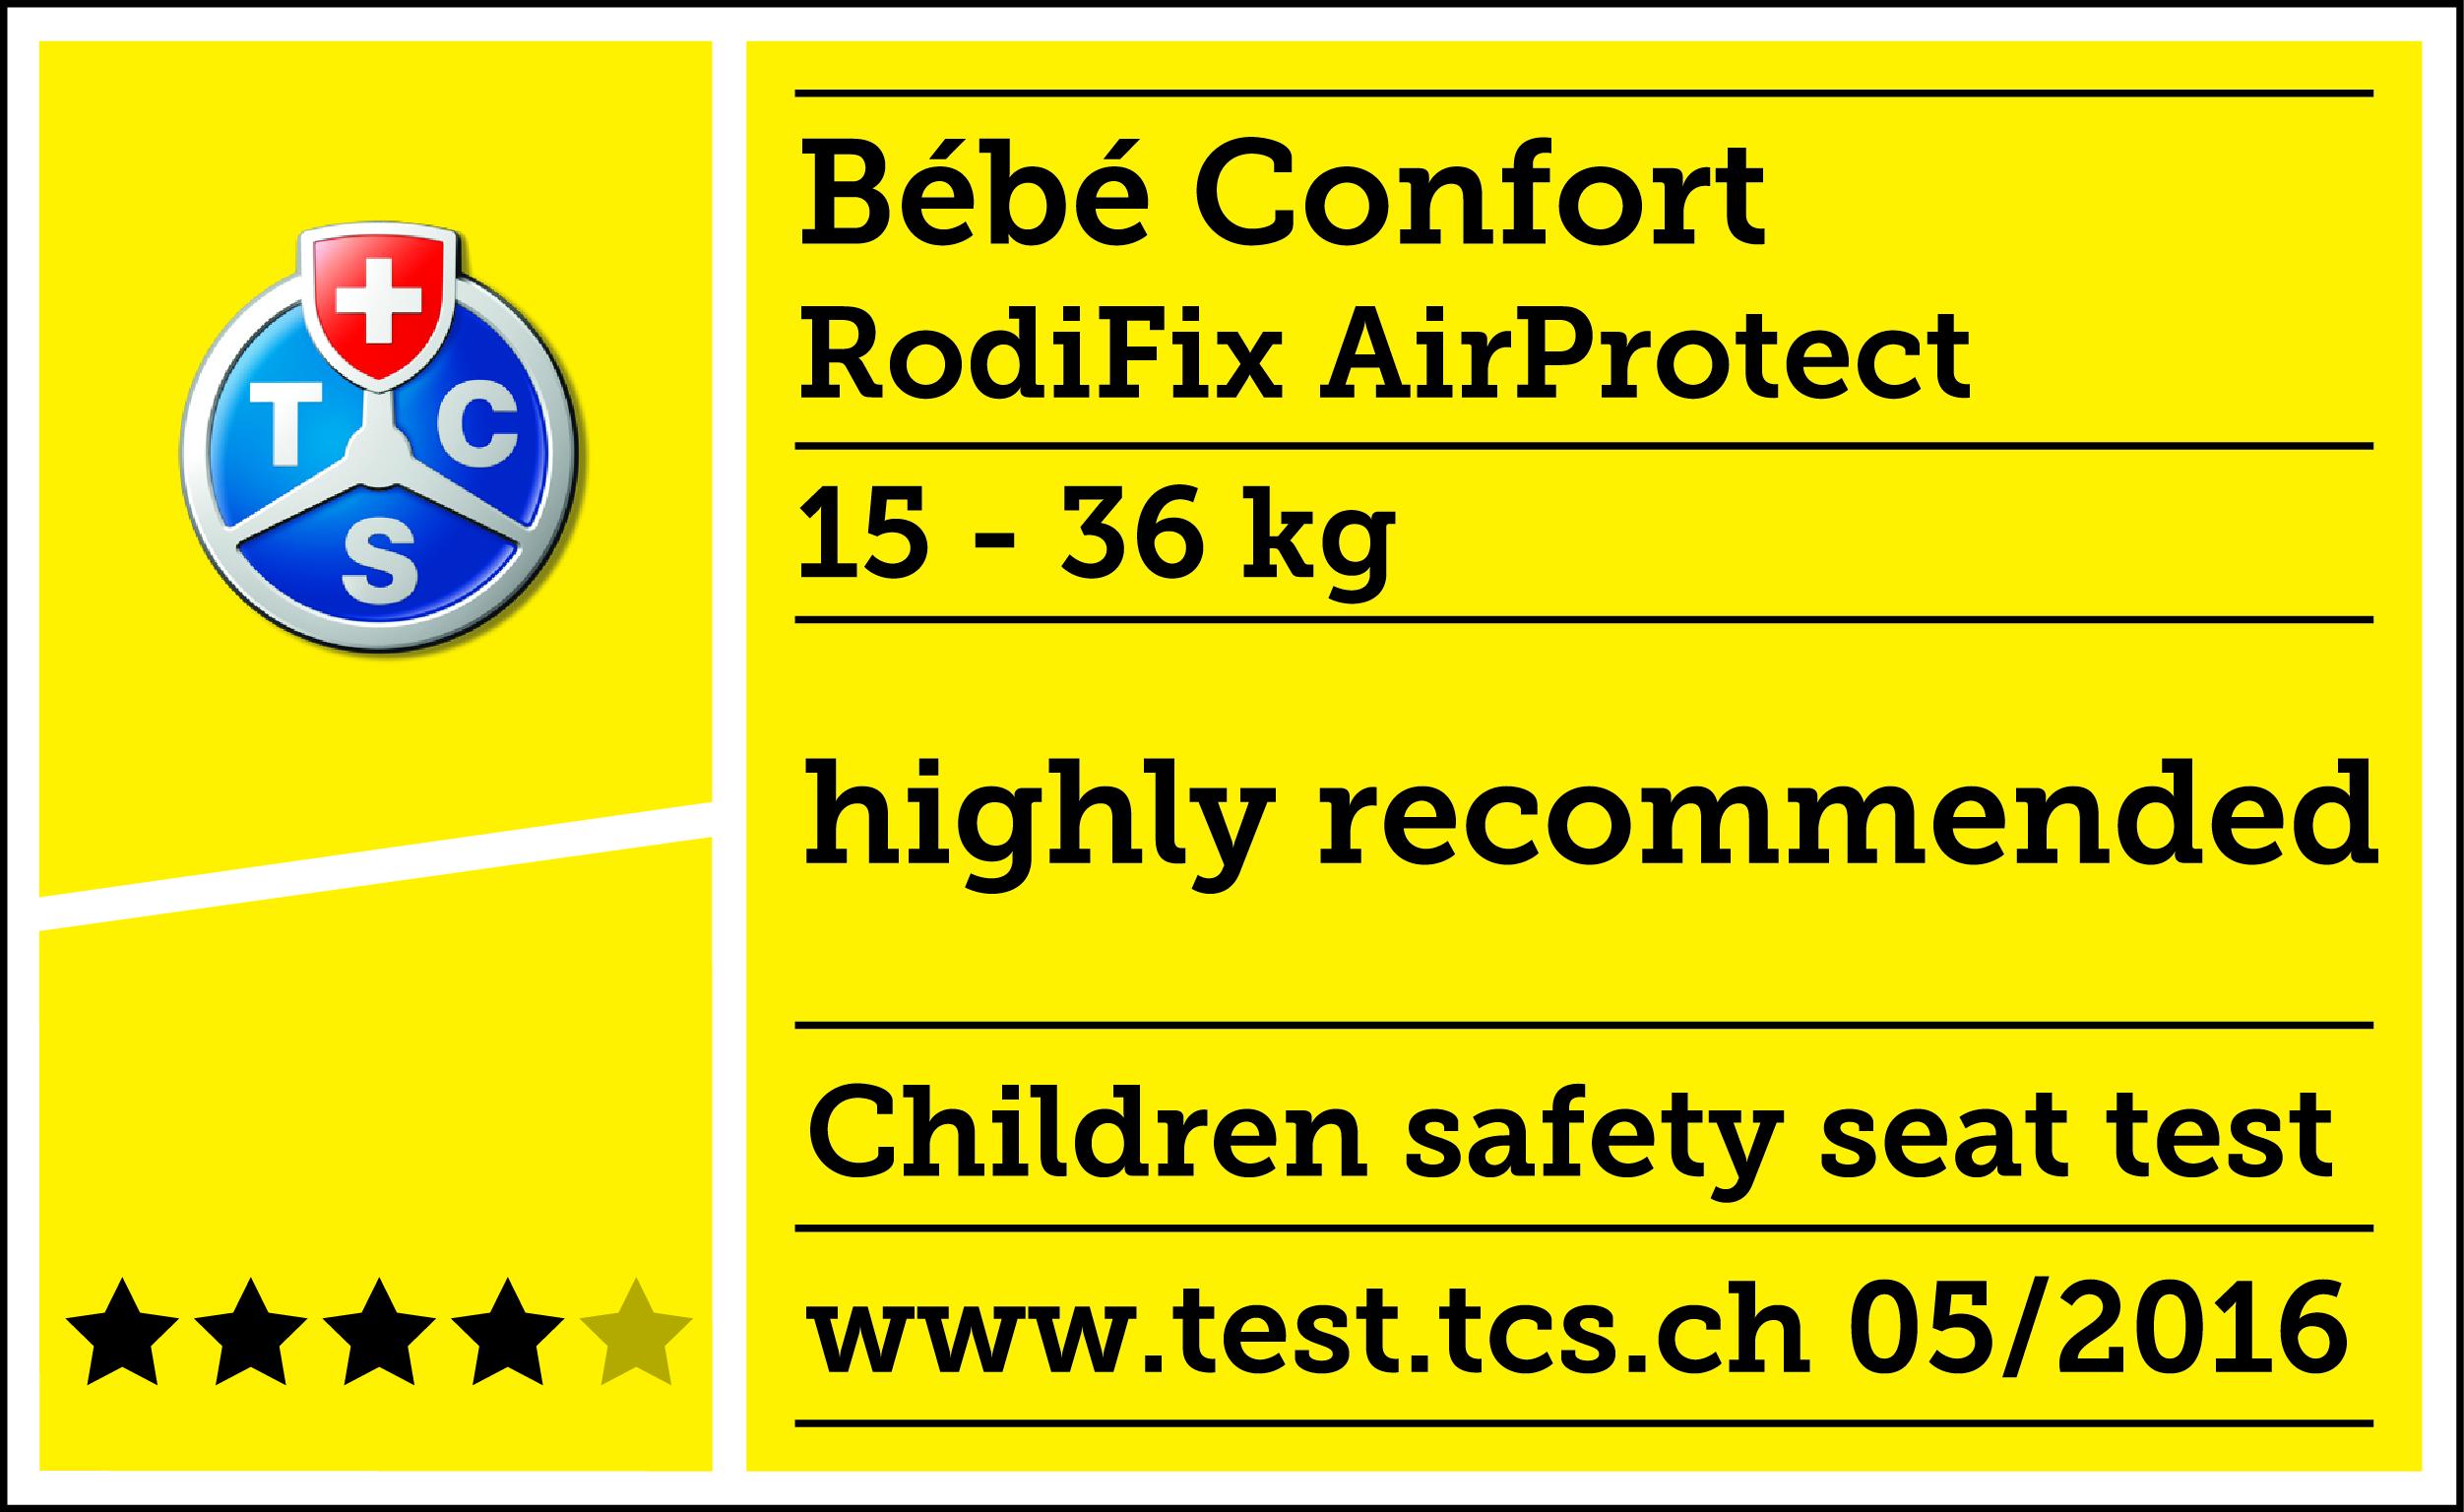 RodiFix AirProtect®